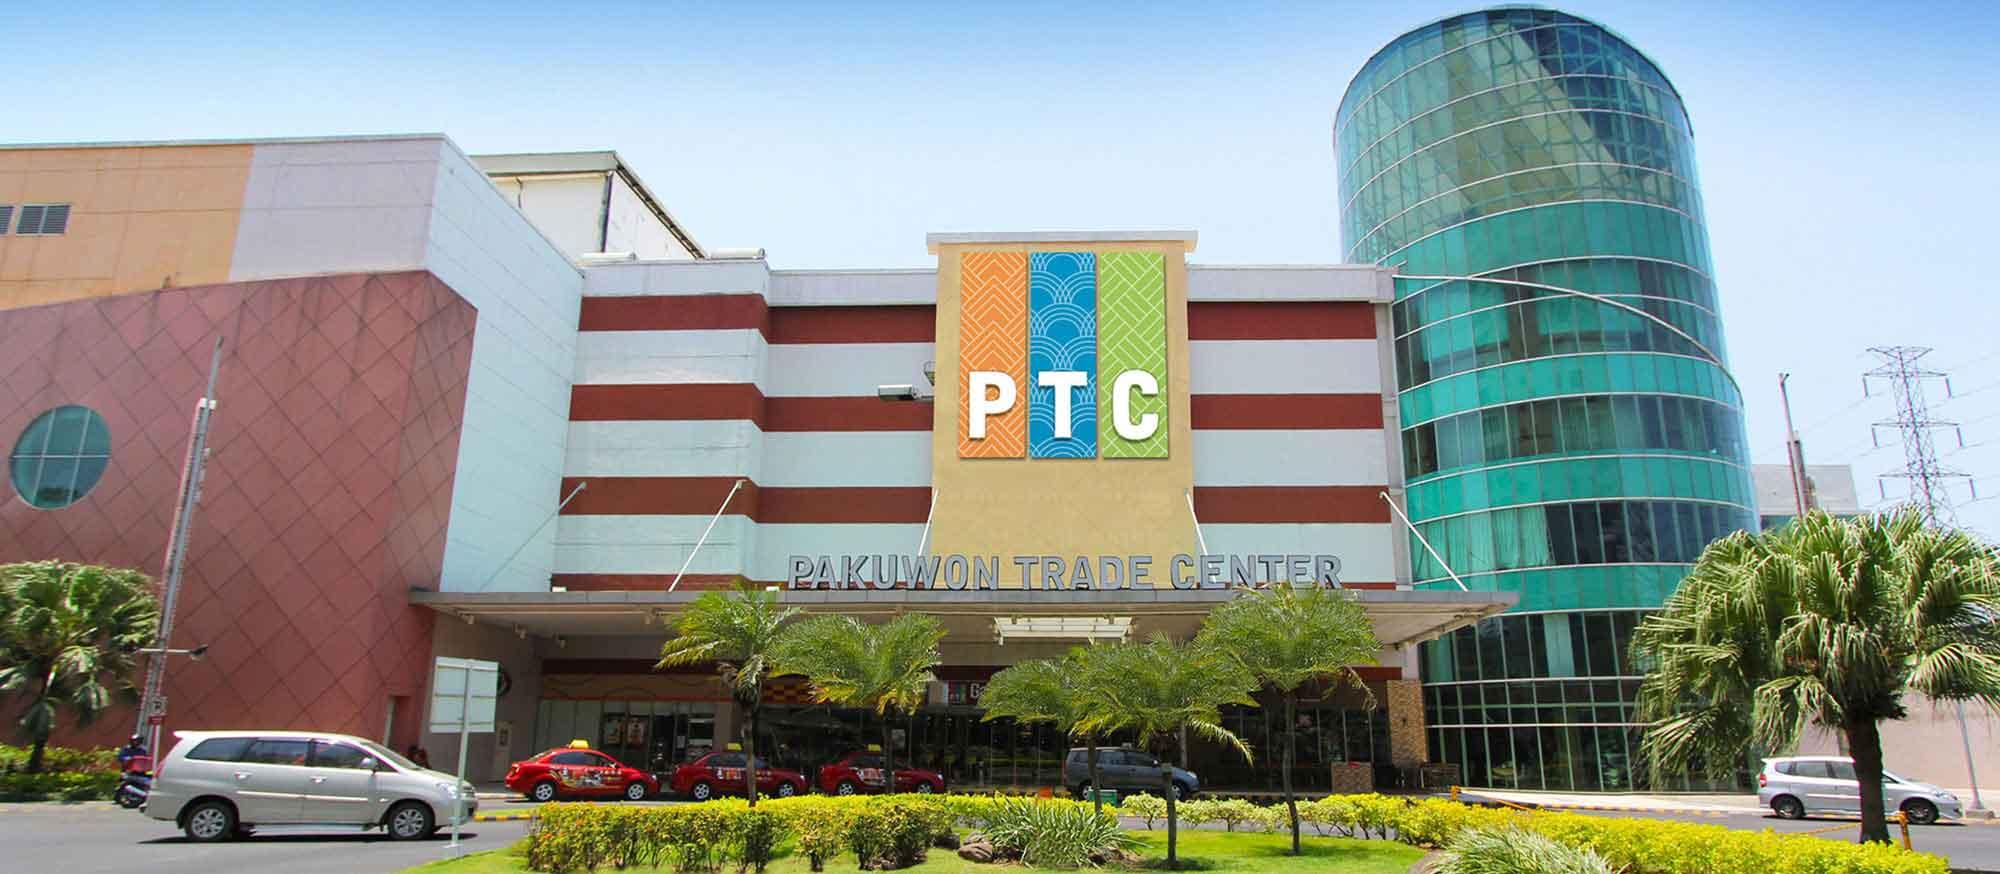 pkw-mall-com-03ptc-topbanner